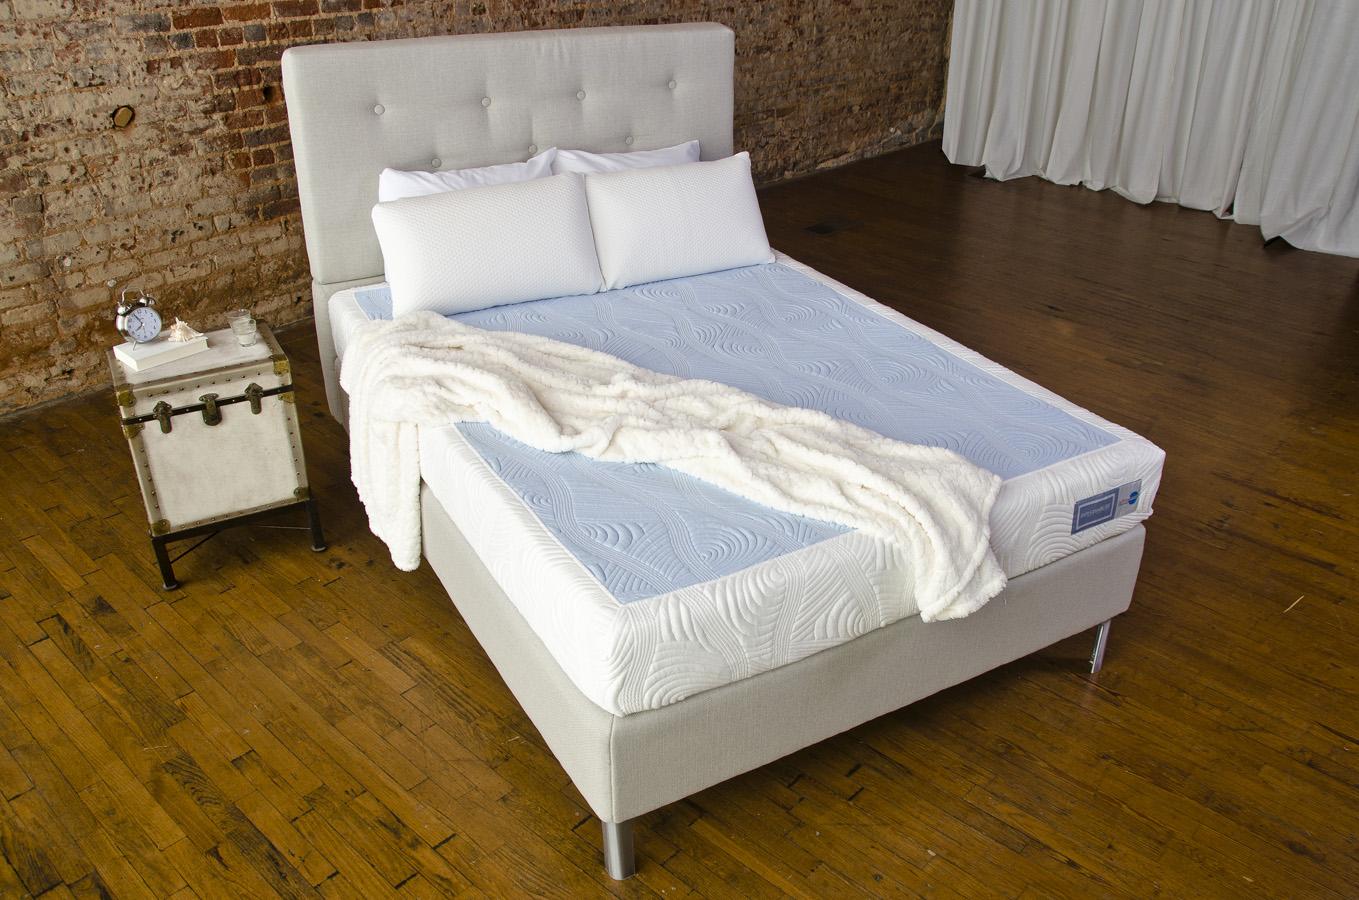 pure latexbliss pamper mattress reviews goodbed com